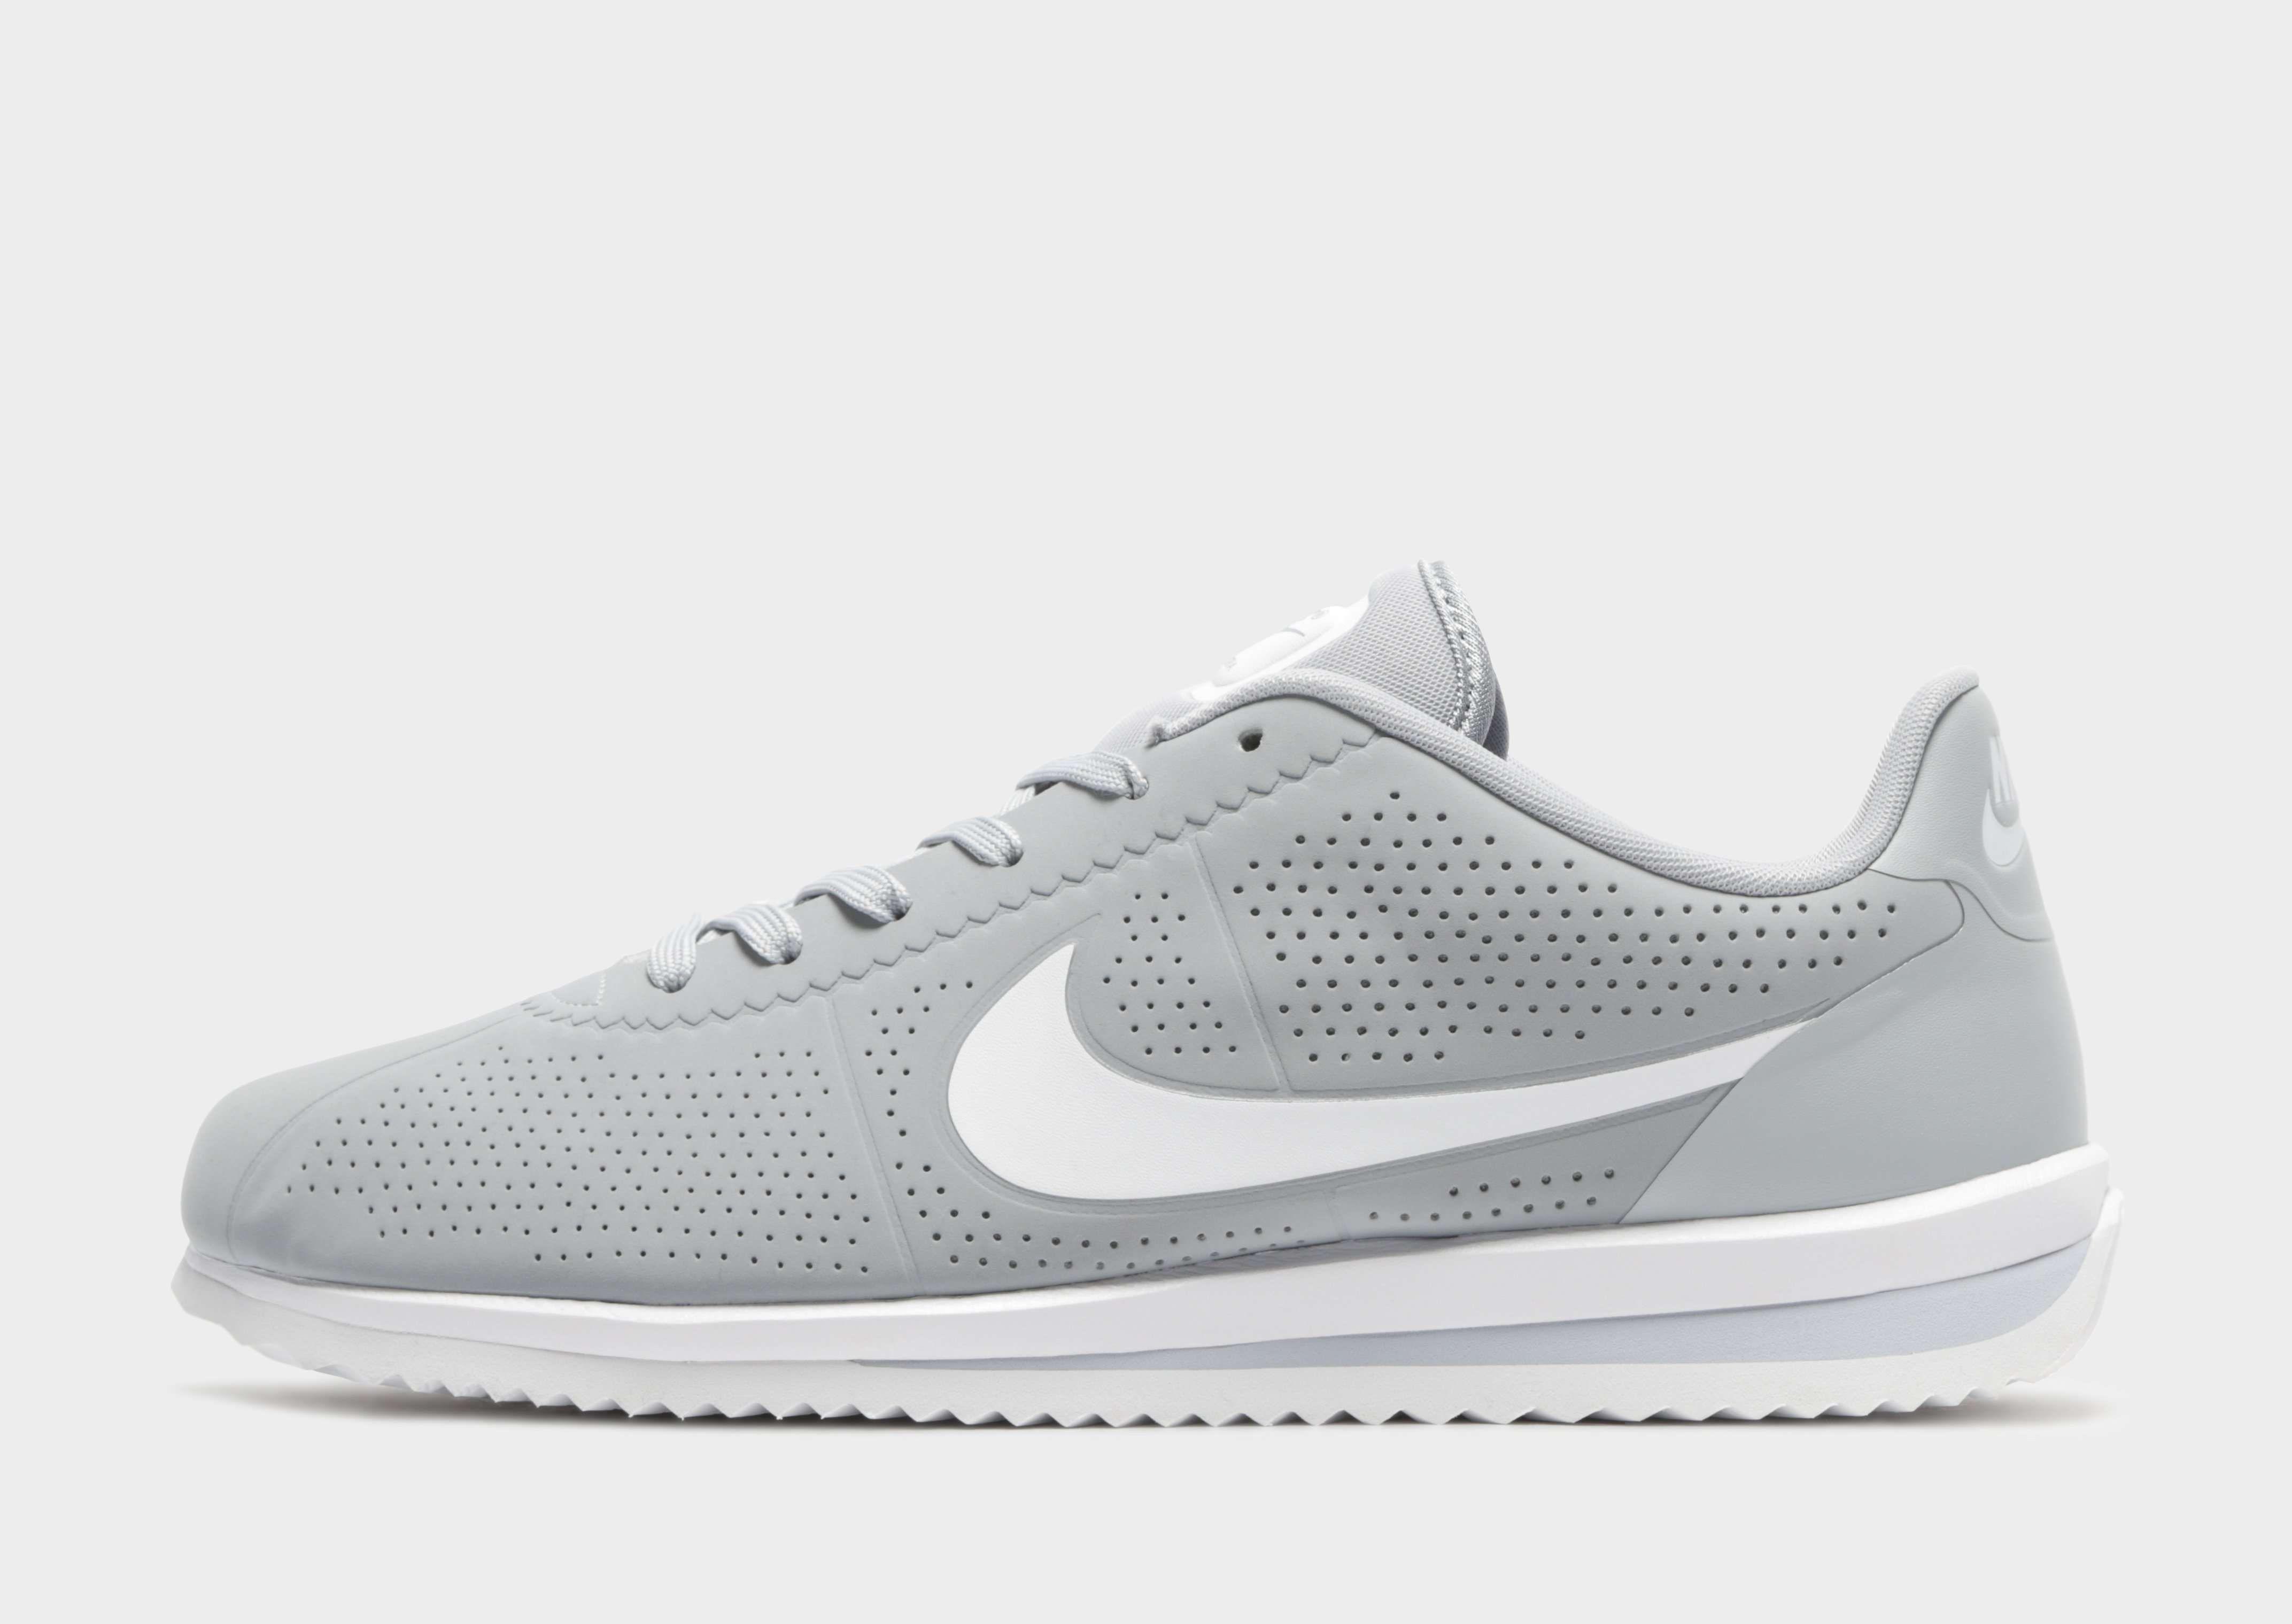 Nike Cortez Ultra Moire Shop online for Nike Cortez